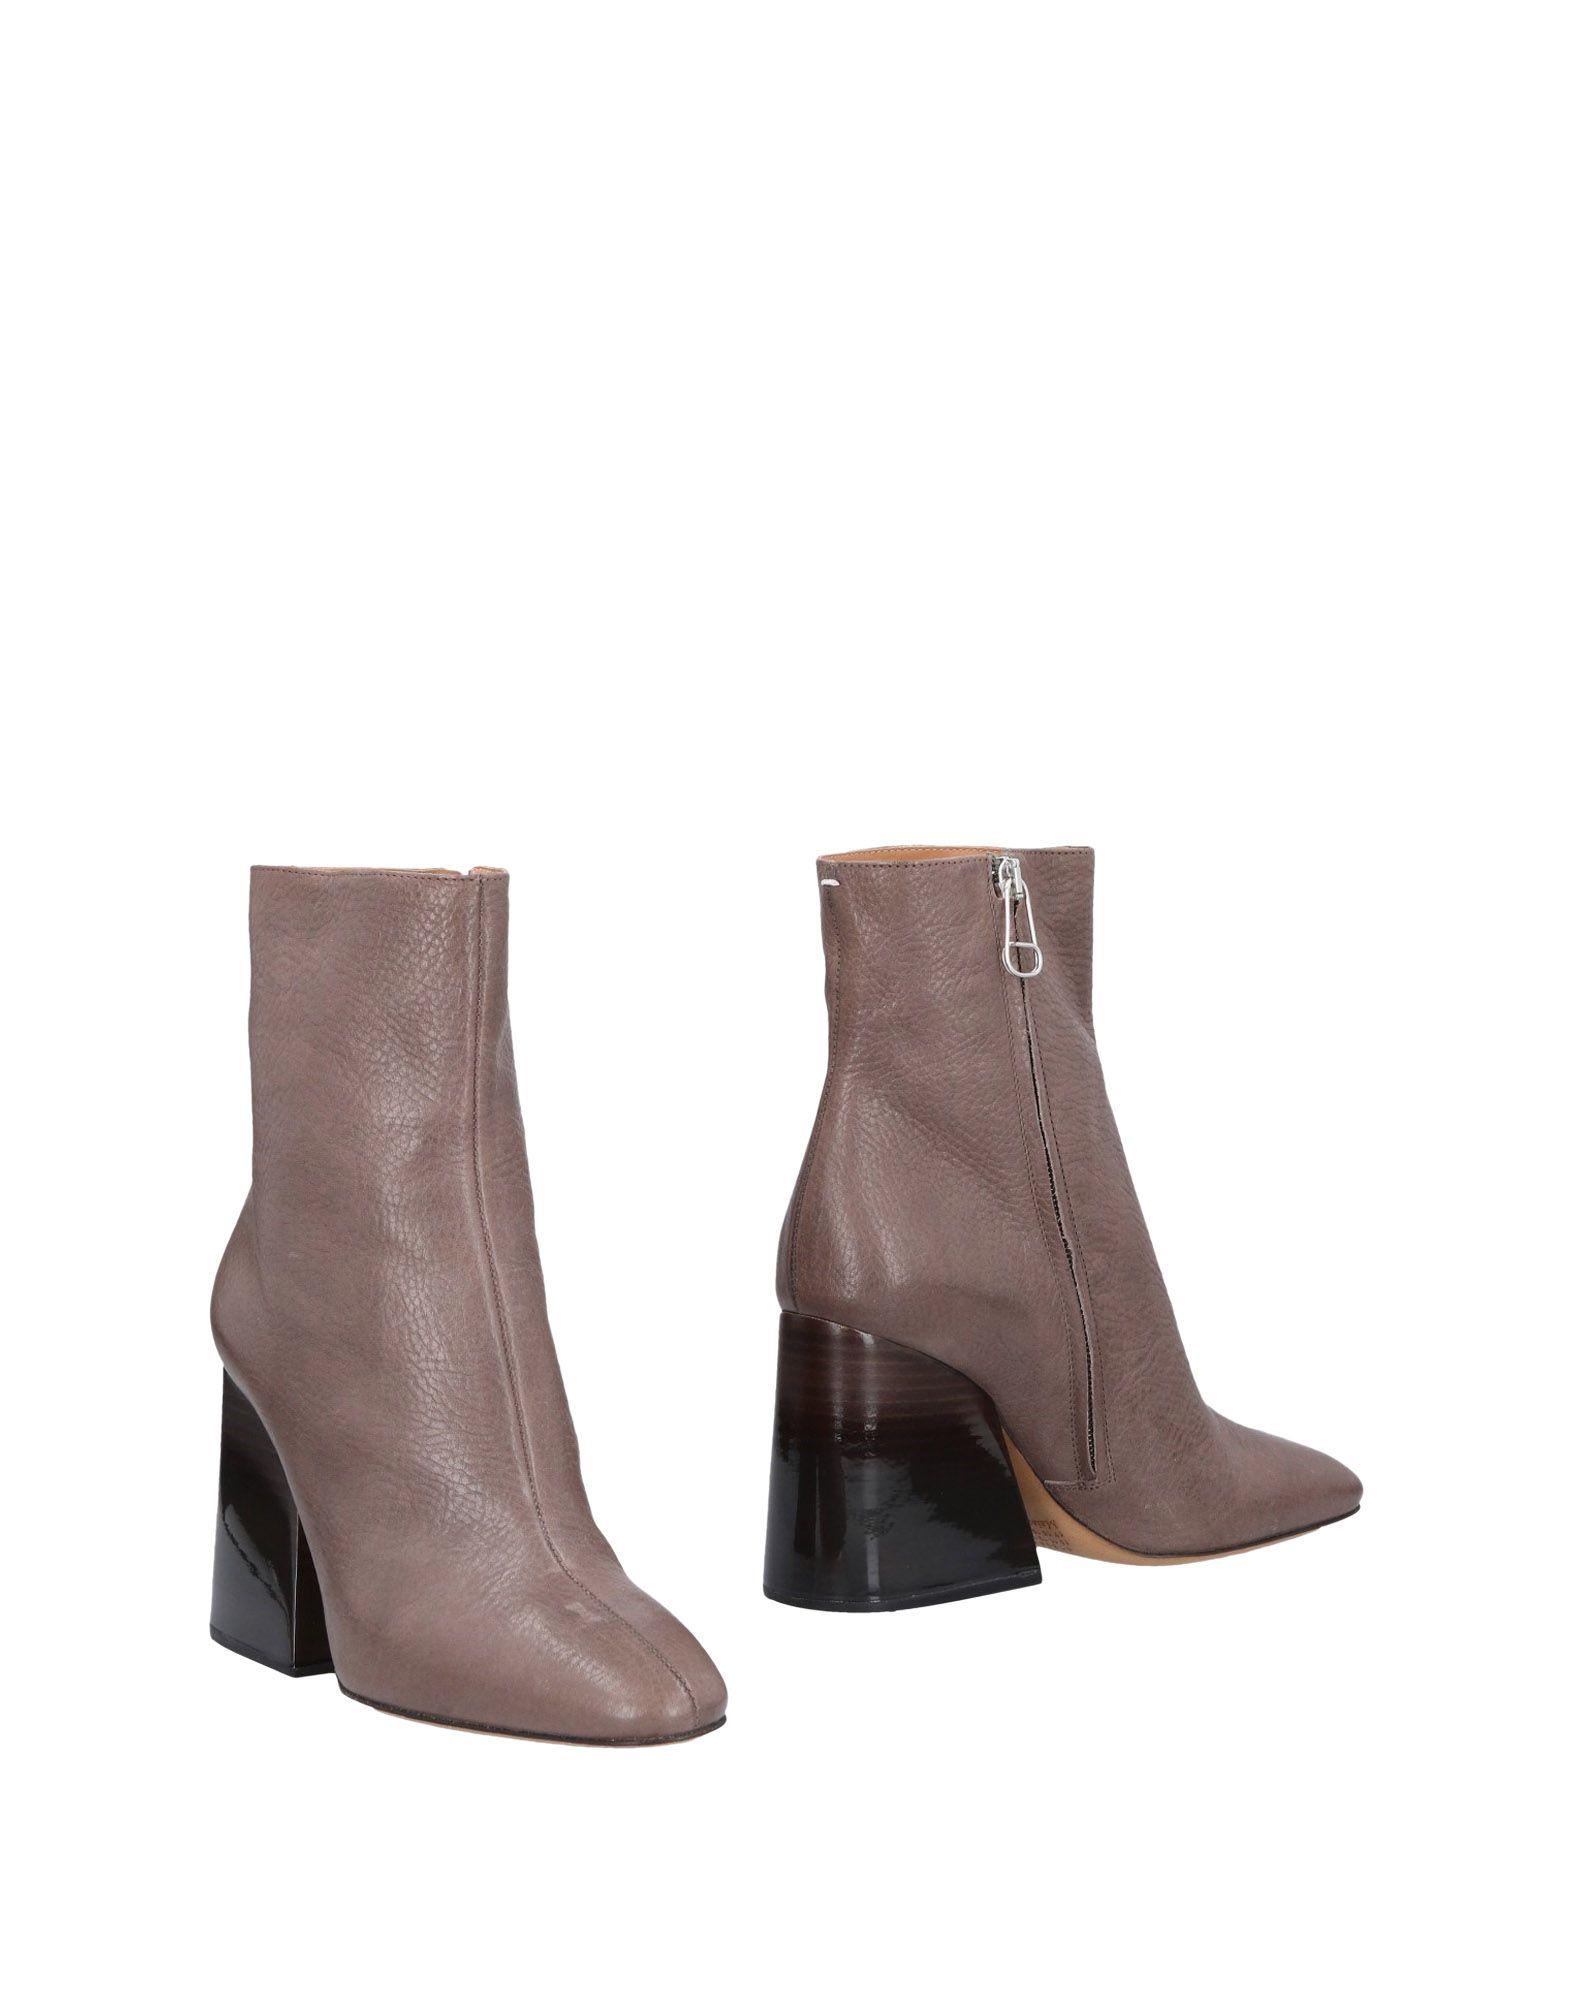 Maison Margiela Stiefelette Damen Schuhe  11471877SVGünstige gut aussehende Schuhe Damen 8dfc68